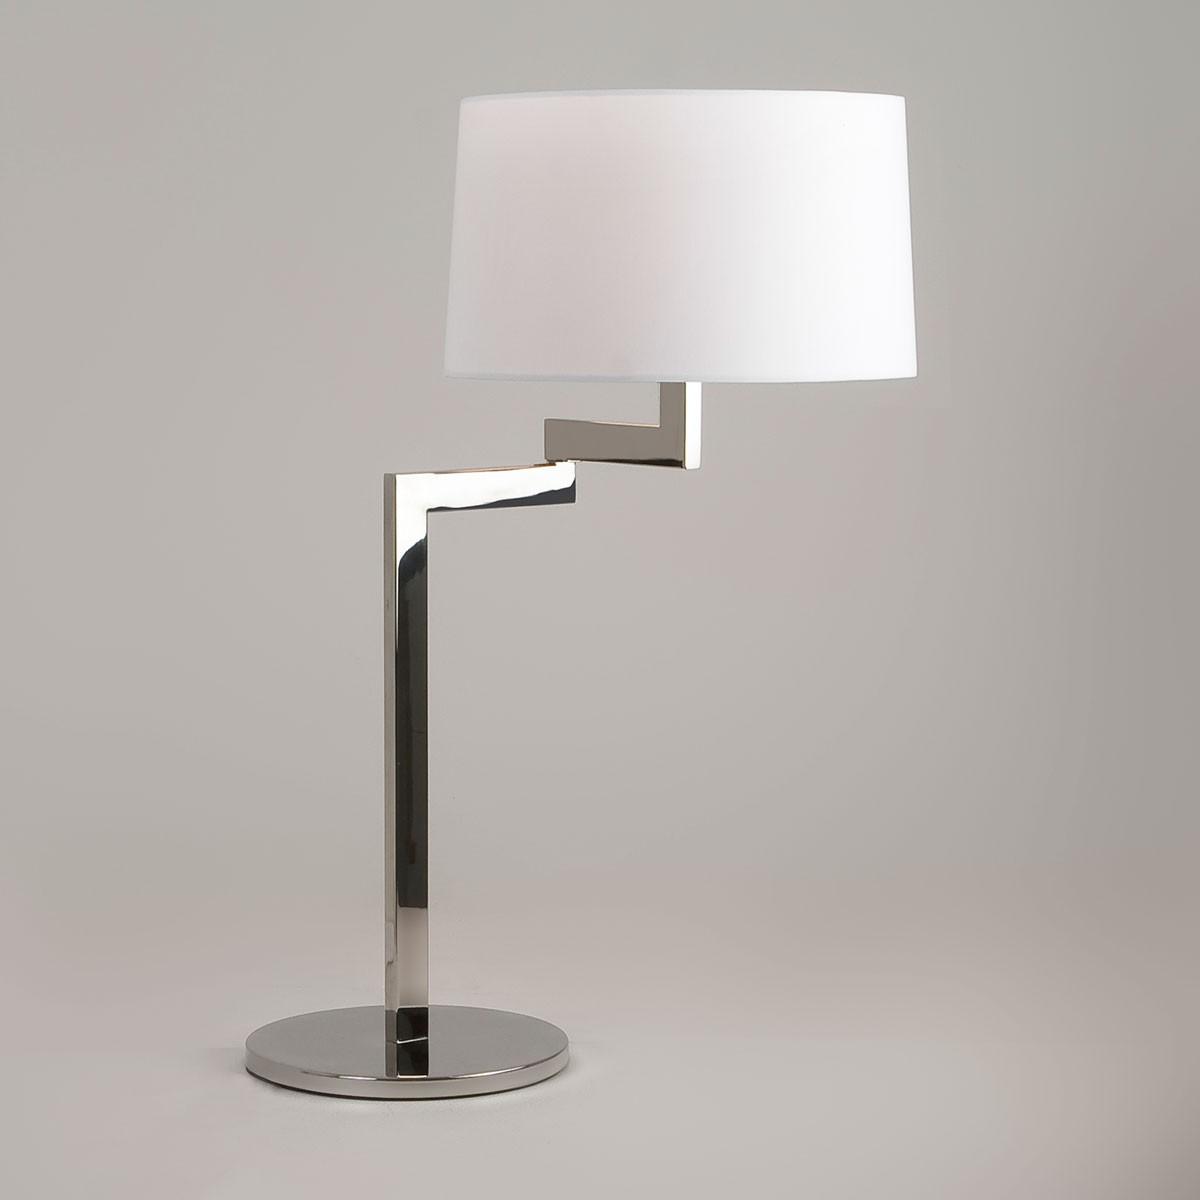 Astro momo table polished chrome table lamp at uk electrical supplies astro momo table polished chrome table lamp aloadofball Choice Image